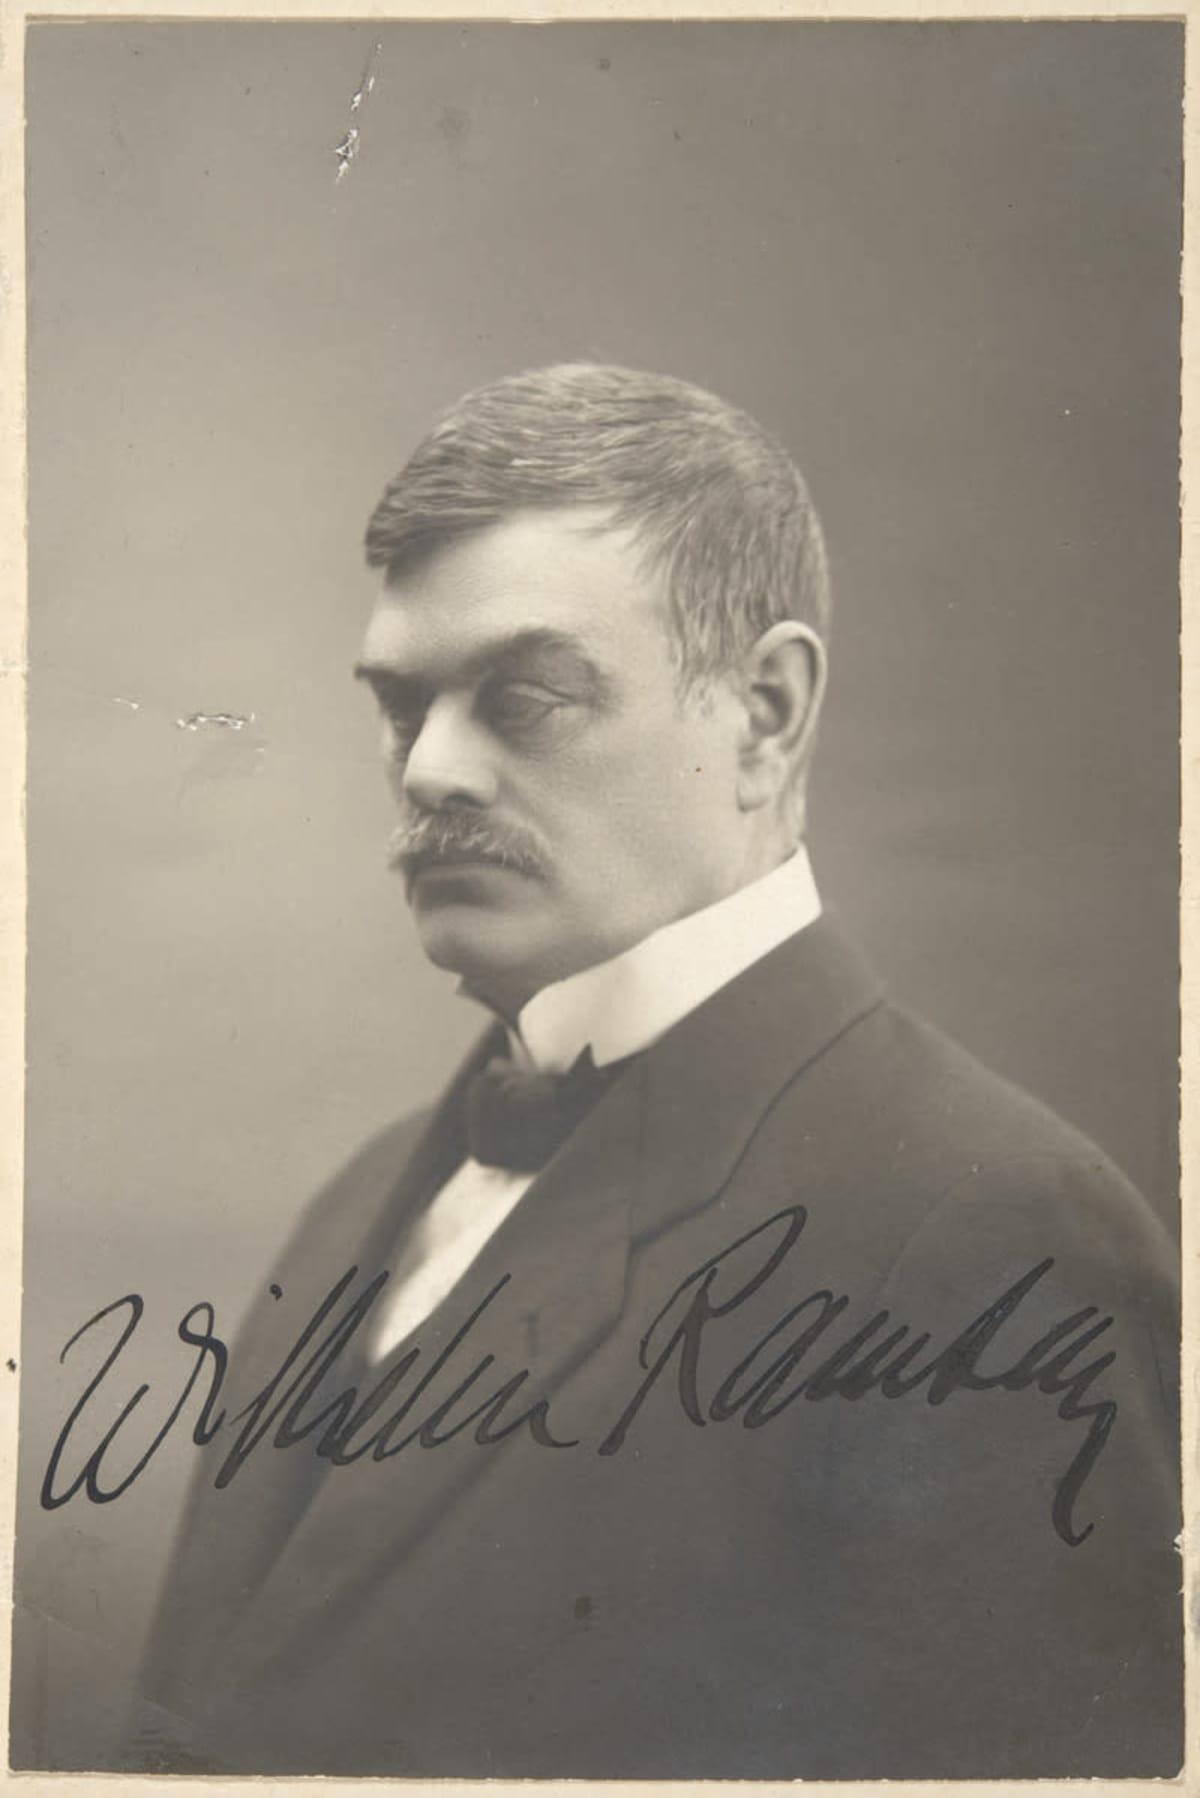 Wilhelm Ramsay 1915